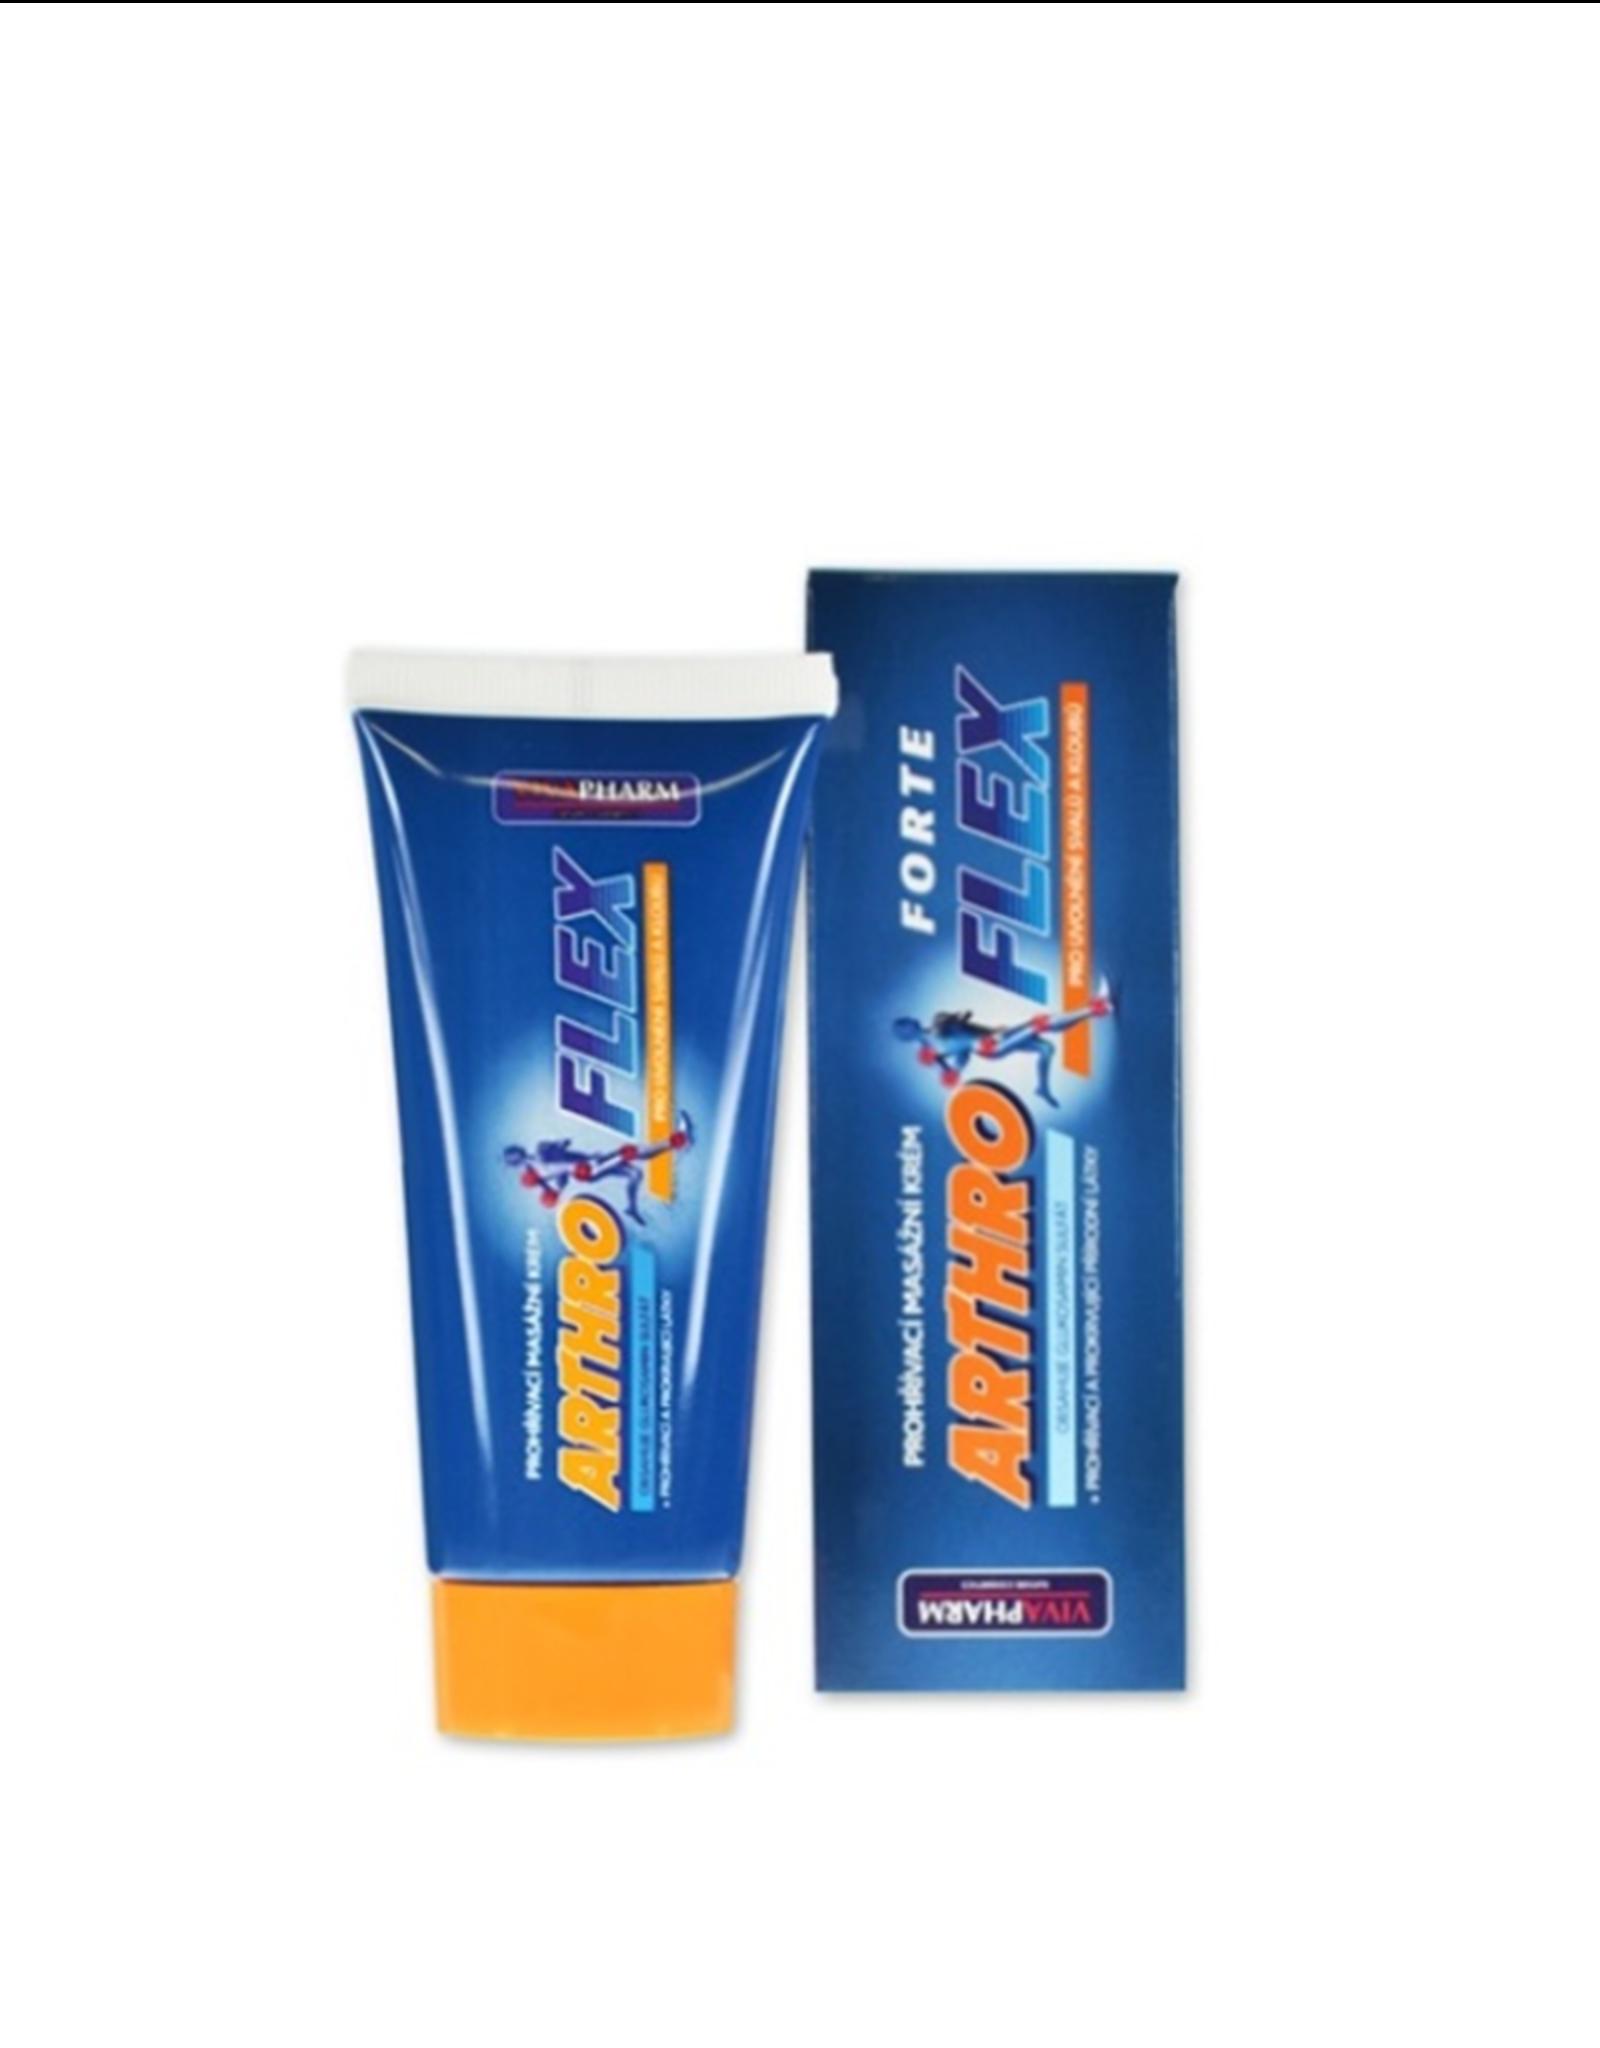 VIVAPHARM®   Arthro Flex Massage Crème